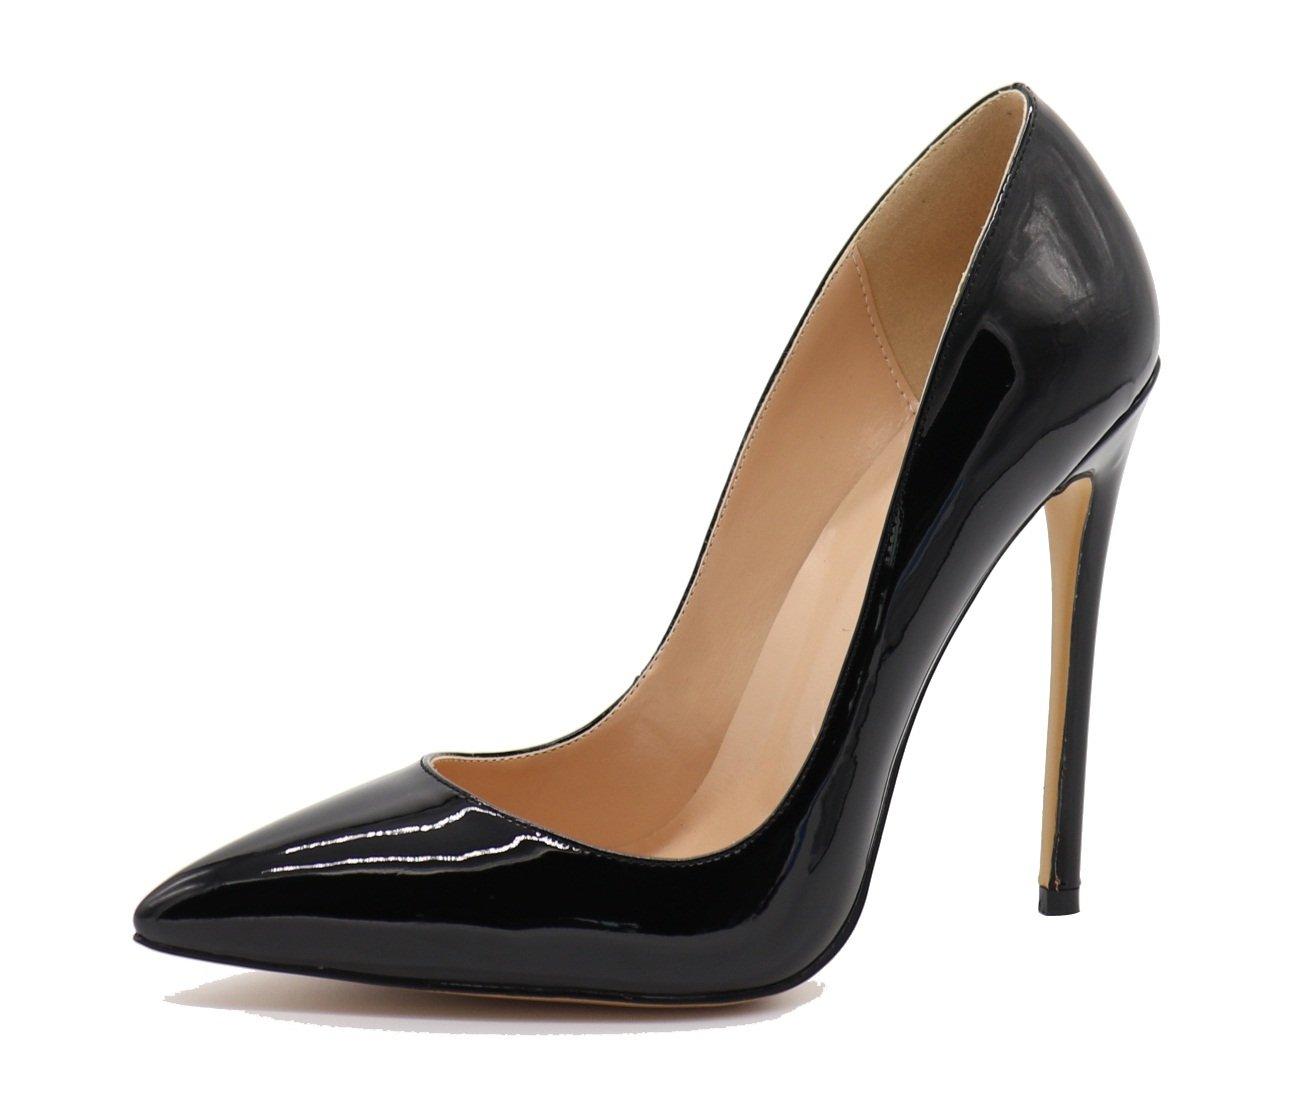 ELASHE - Zapatos de Mujer Tacon Alto - 12 CM Clásicas Tacones Altos - Boda Wedding Cerrado Mujer 40 EU|Beige